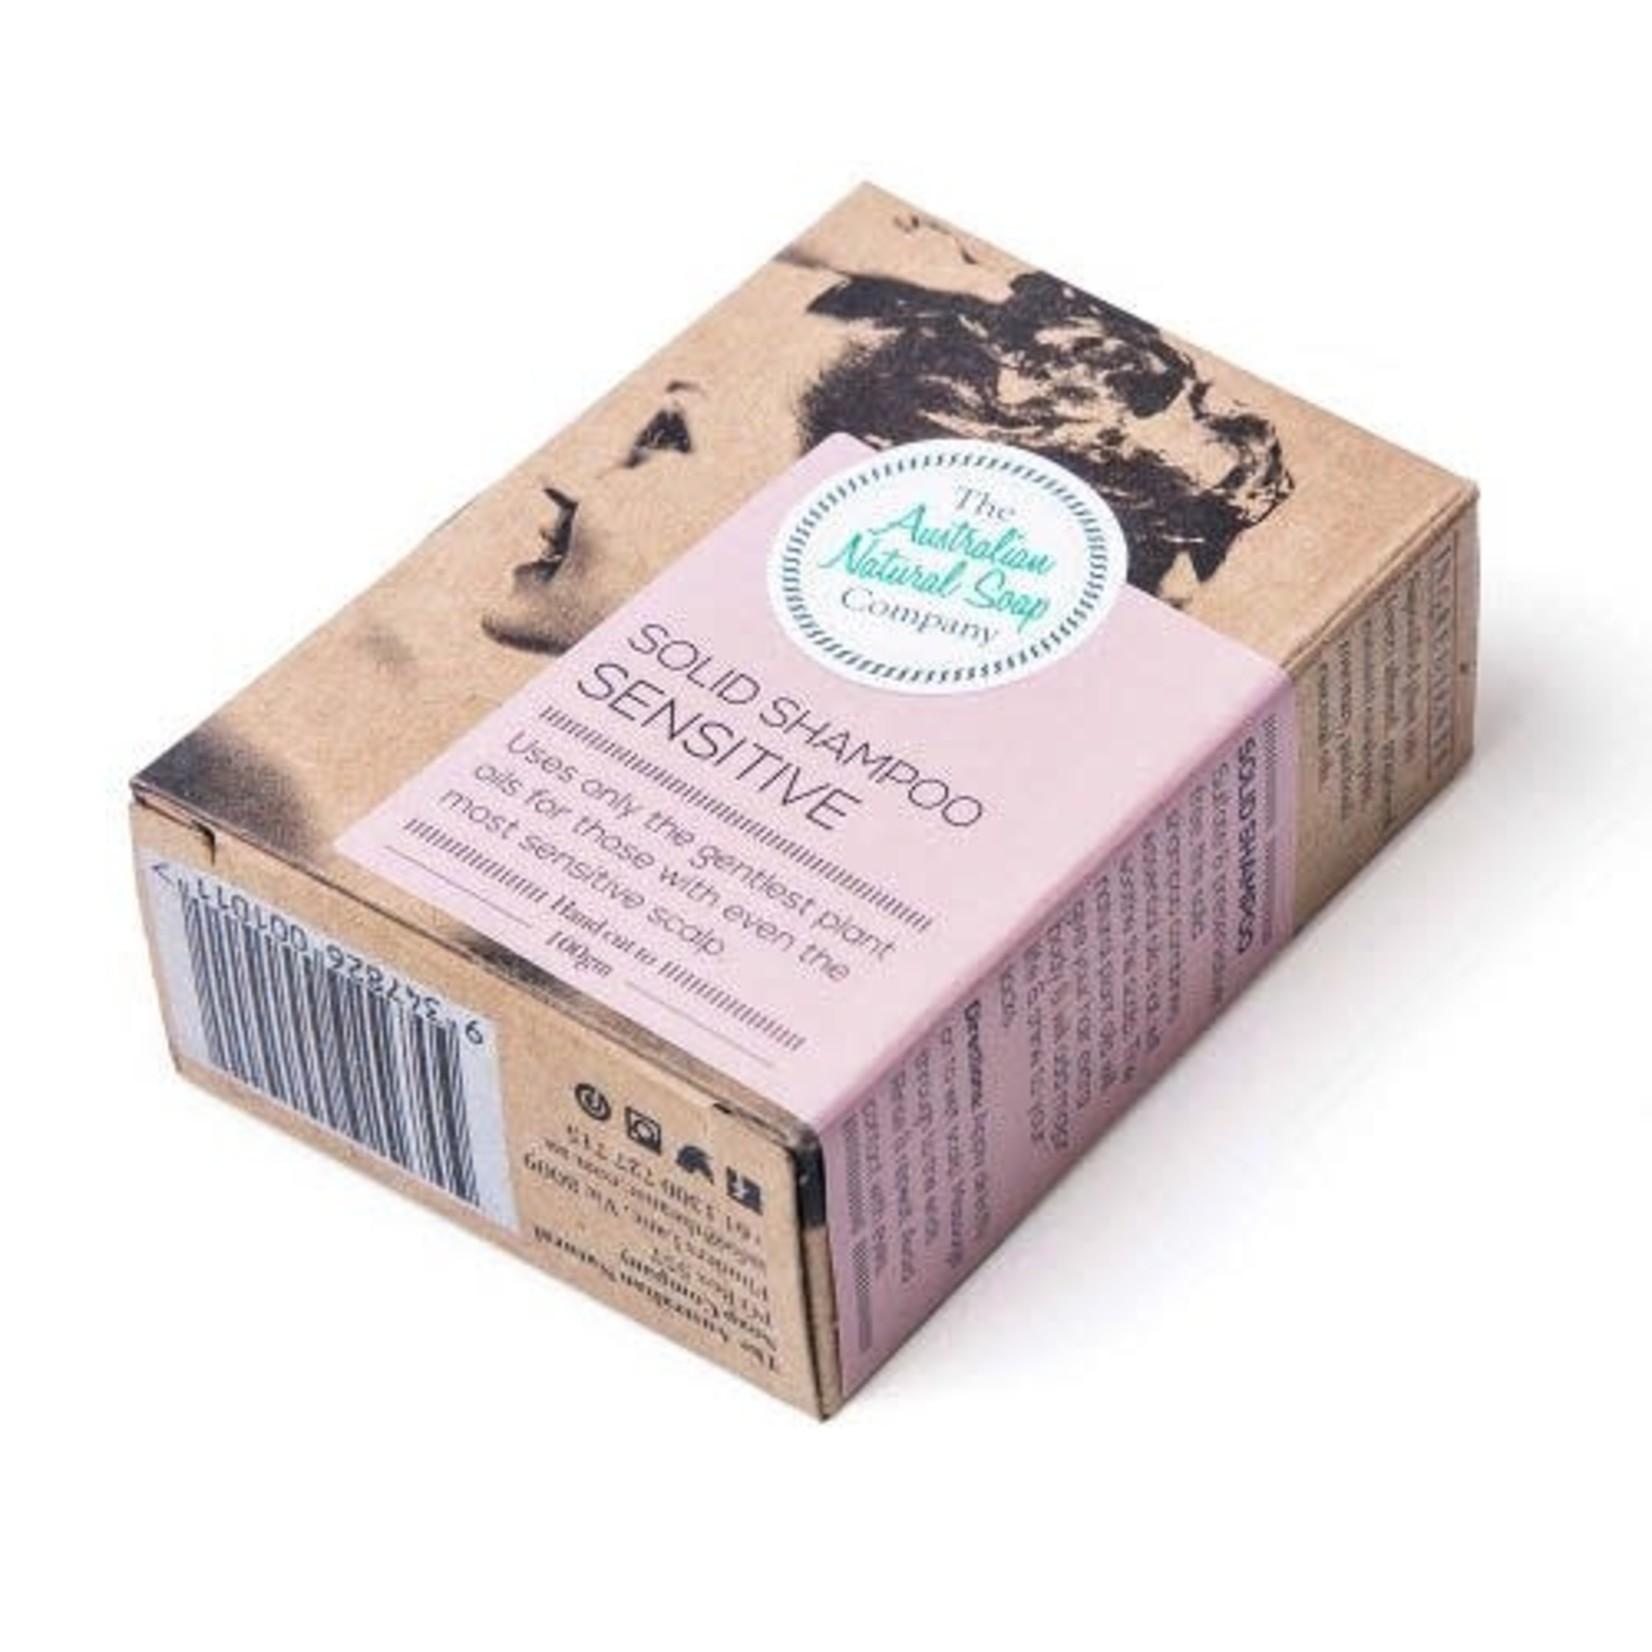 The Australian Natural Soap Company The Australian Natural Soap Company Shampoo Bar Sensitive